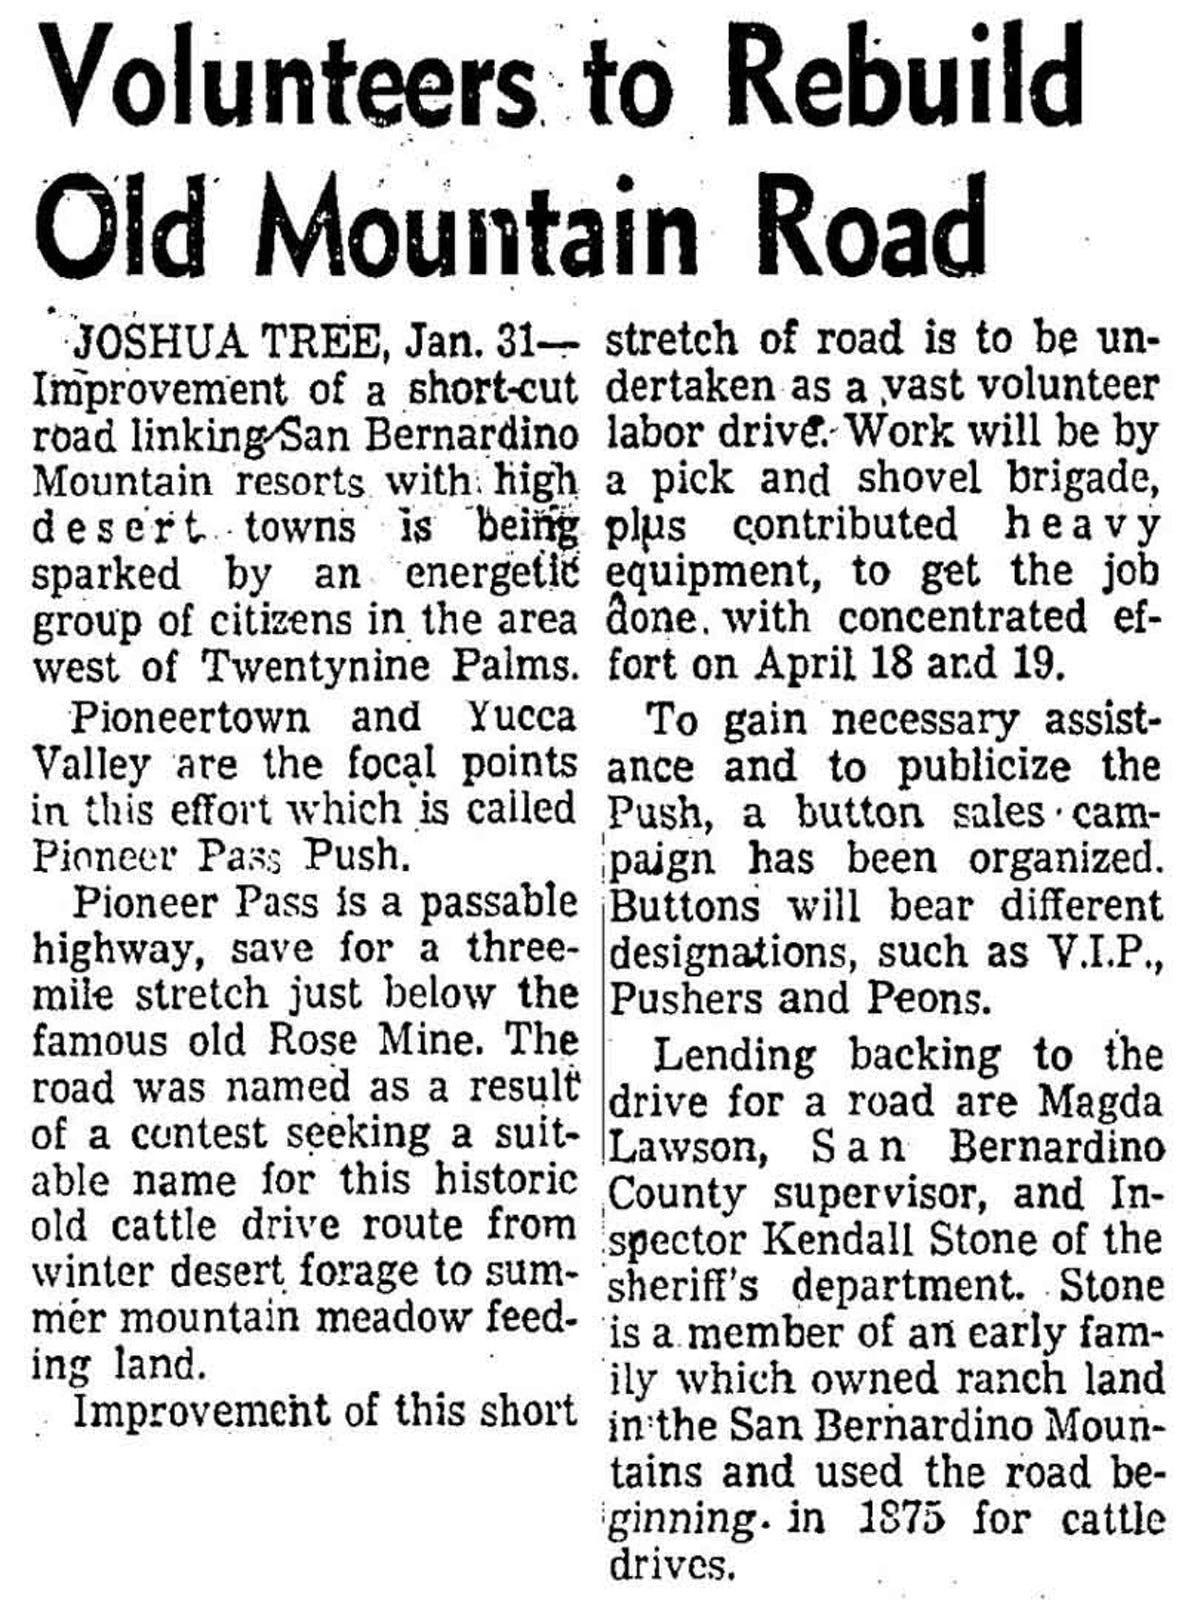 Feb. 1, 1959 - Los Angele Times